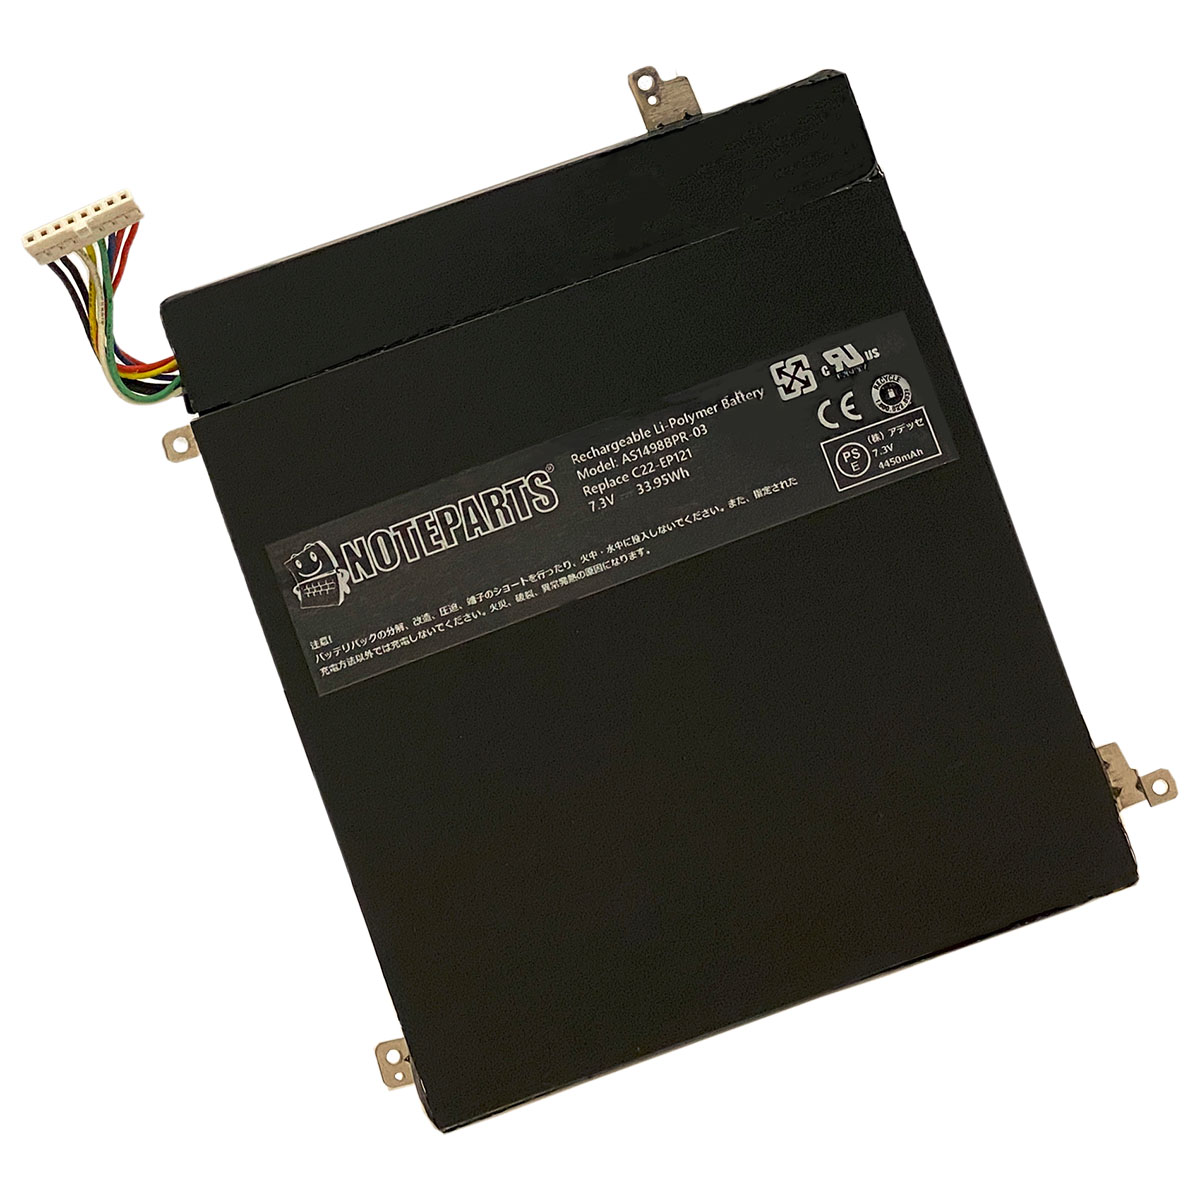 Asus エイスース Eee Slate B121 EP121 バッテリー C22-EP121対応